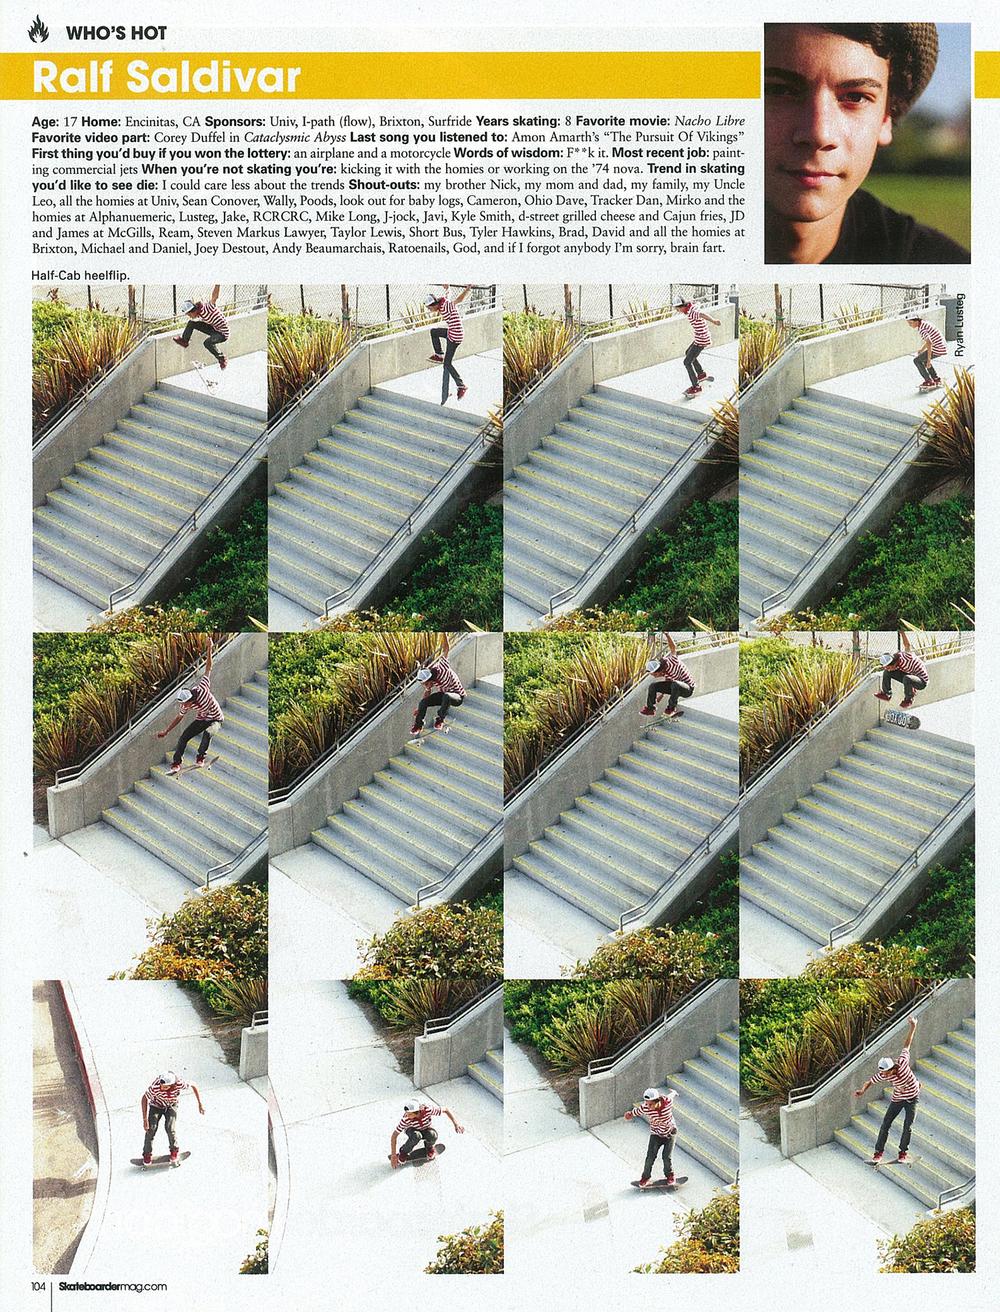 43_ralf_saldivar_whos_hot_skateboarder.jpg